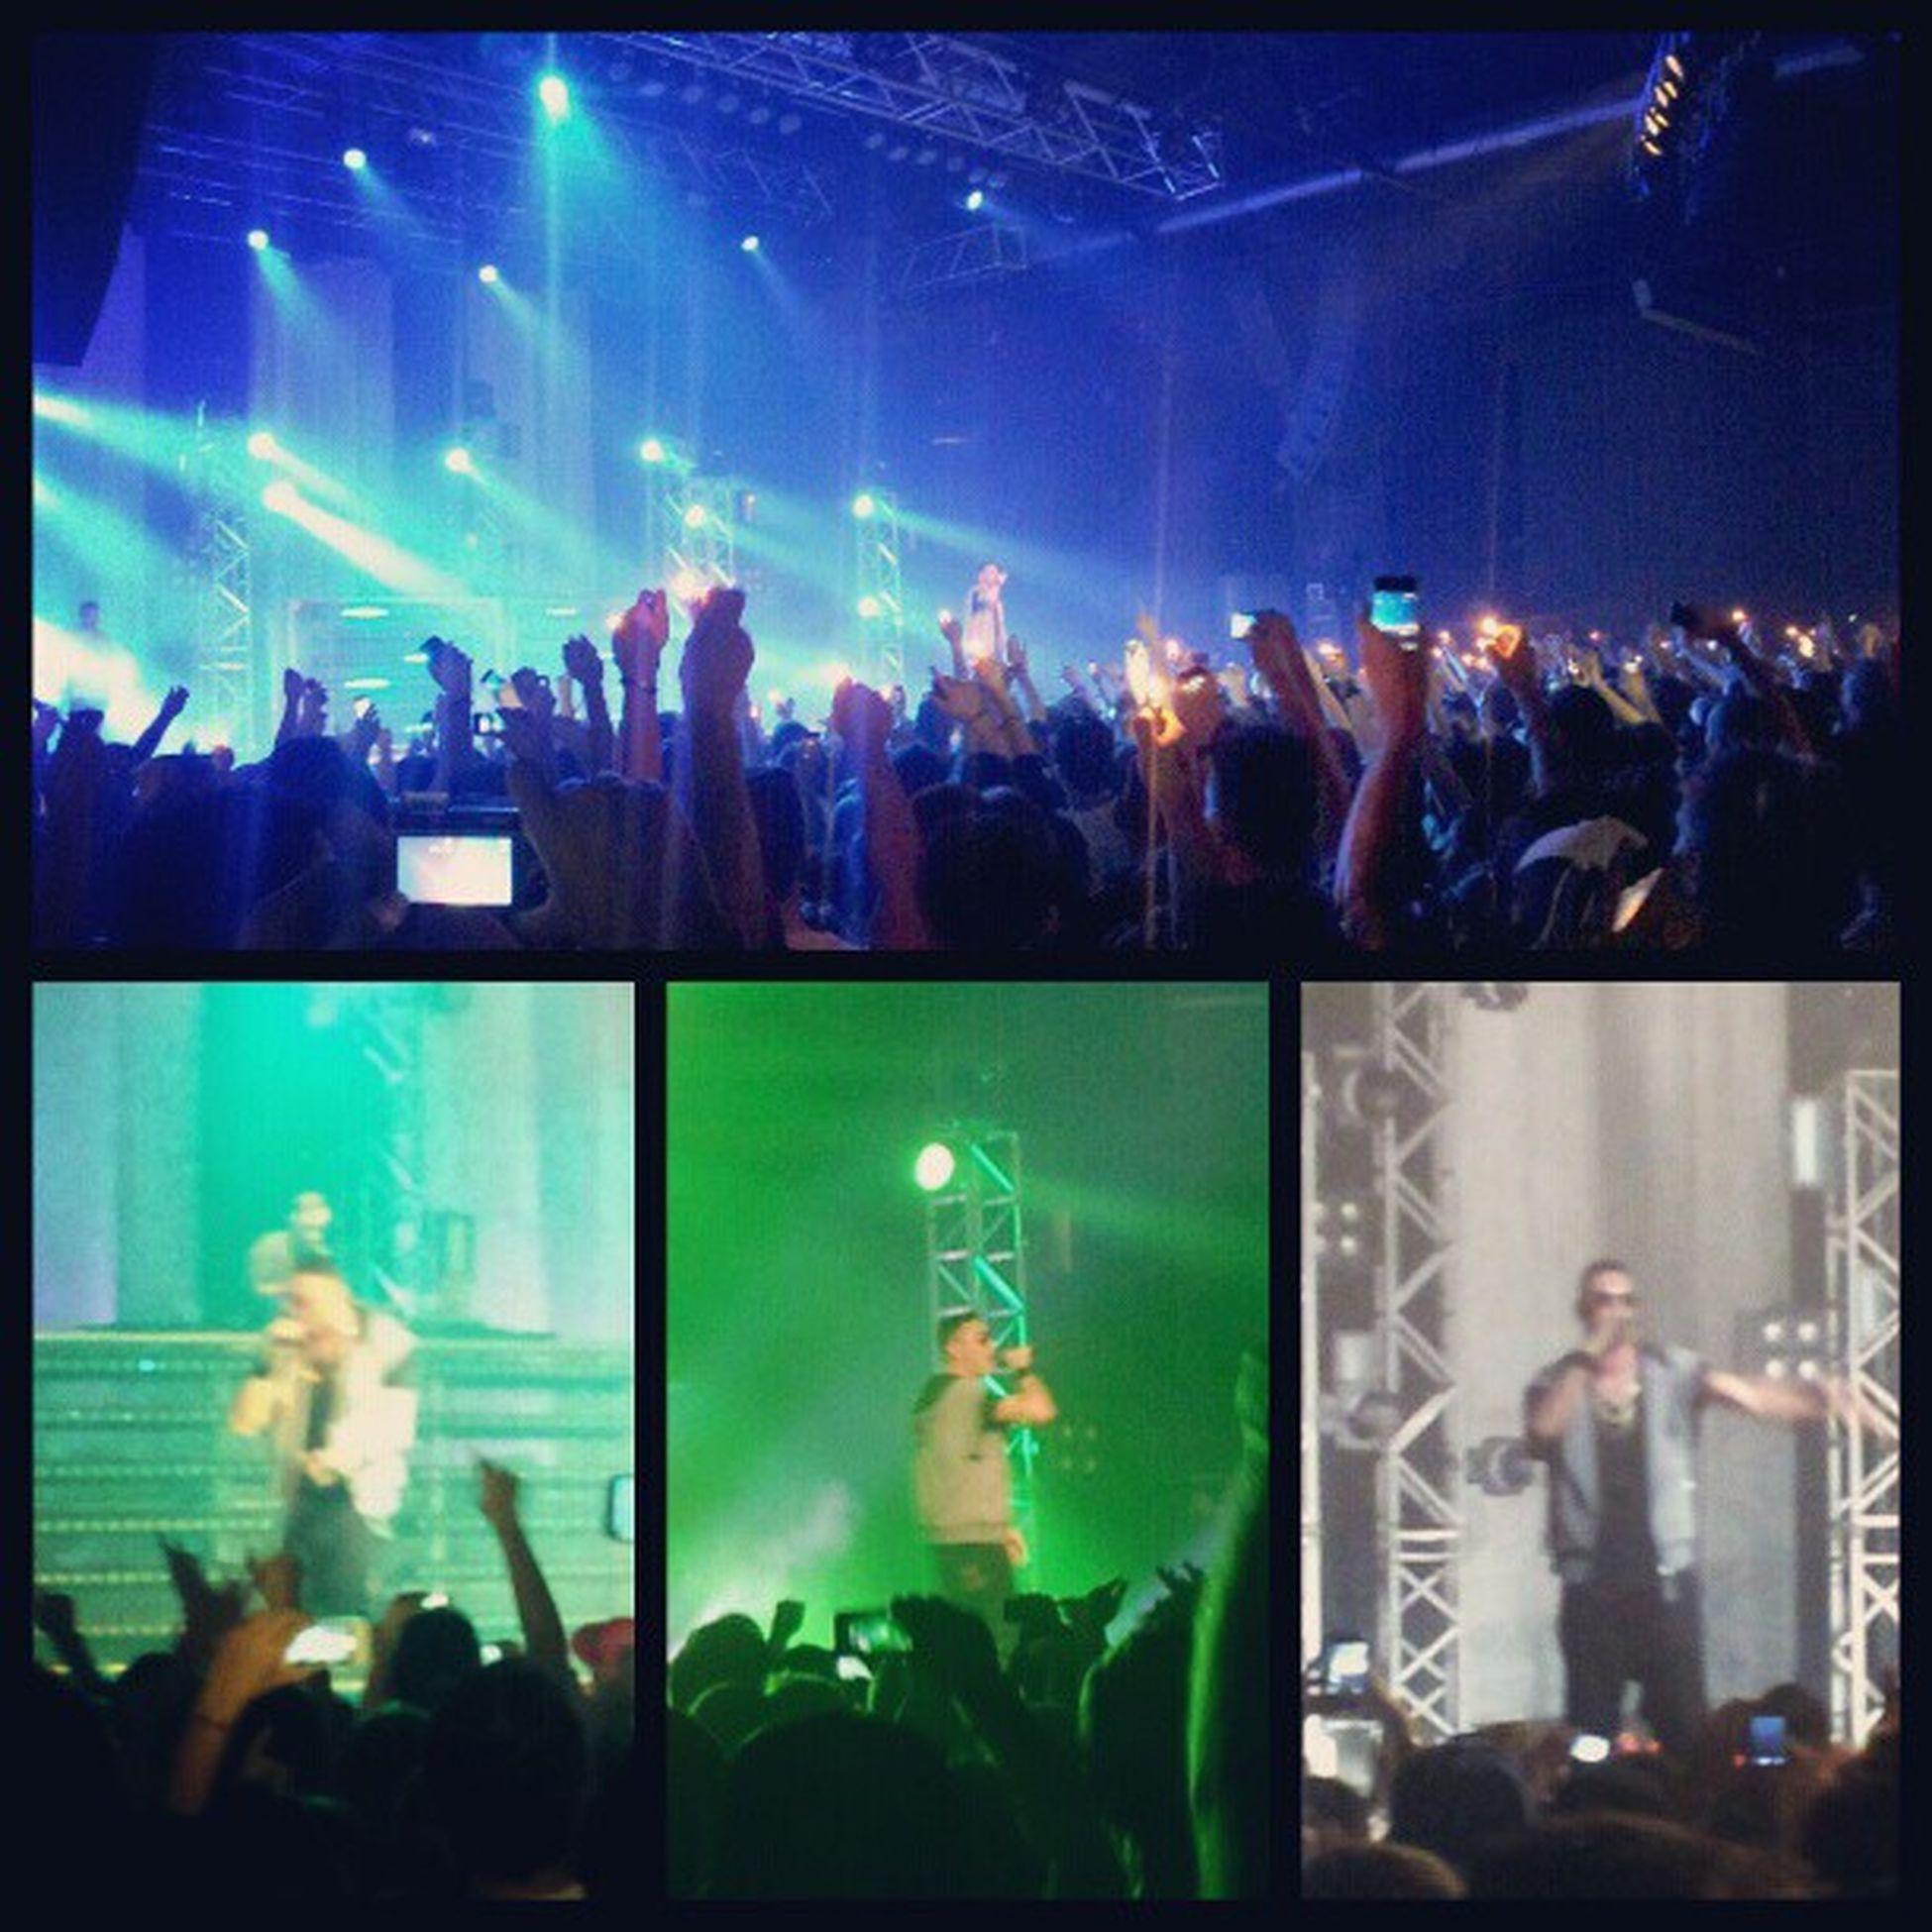 Marracash  GiustoUnGiroTour Milano RocciaMusic Onstage KingDelRap DayOne 20/11/2012